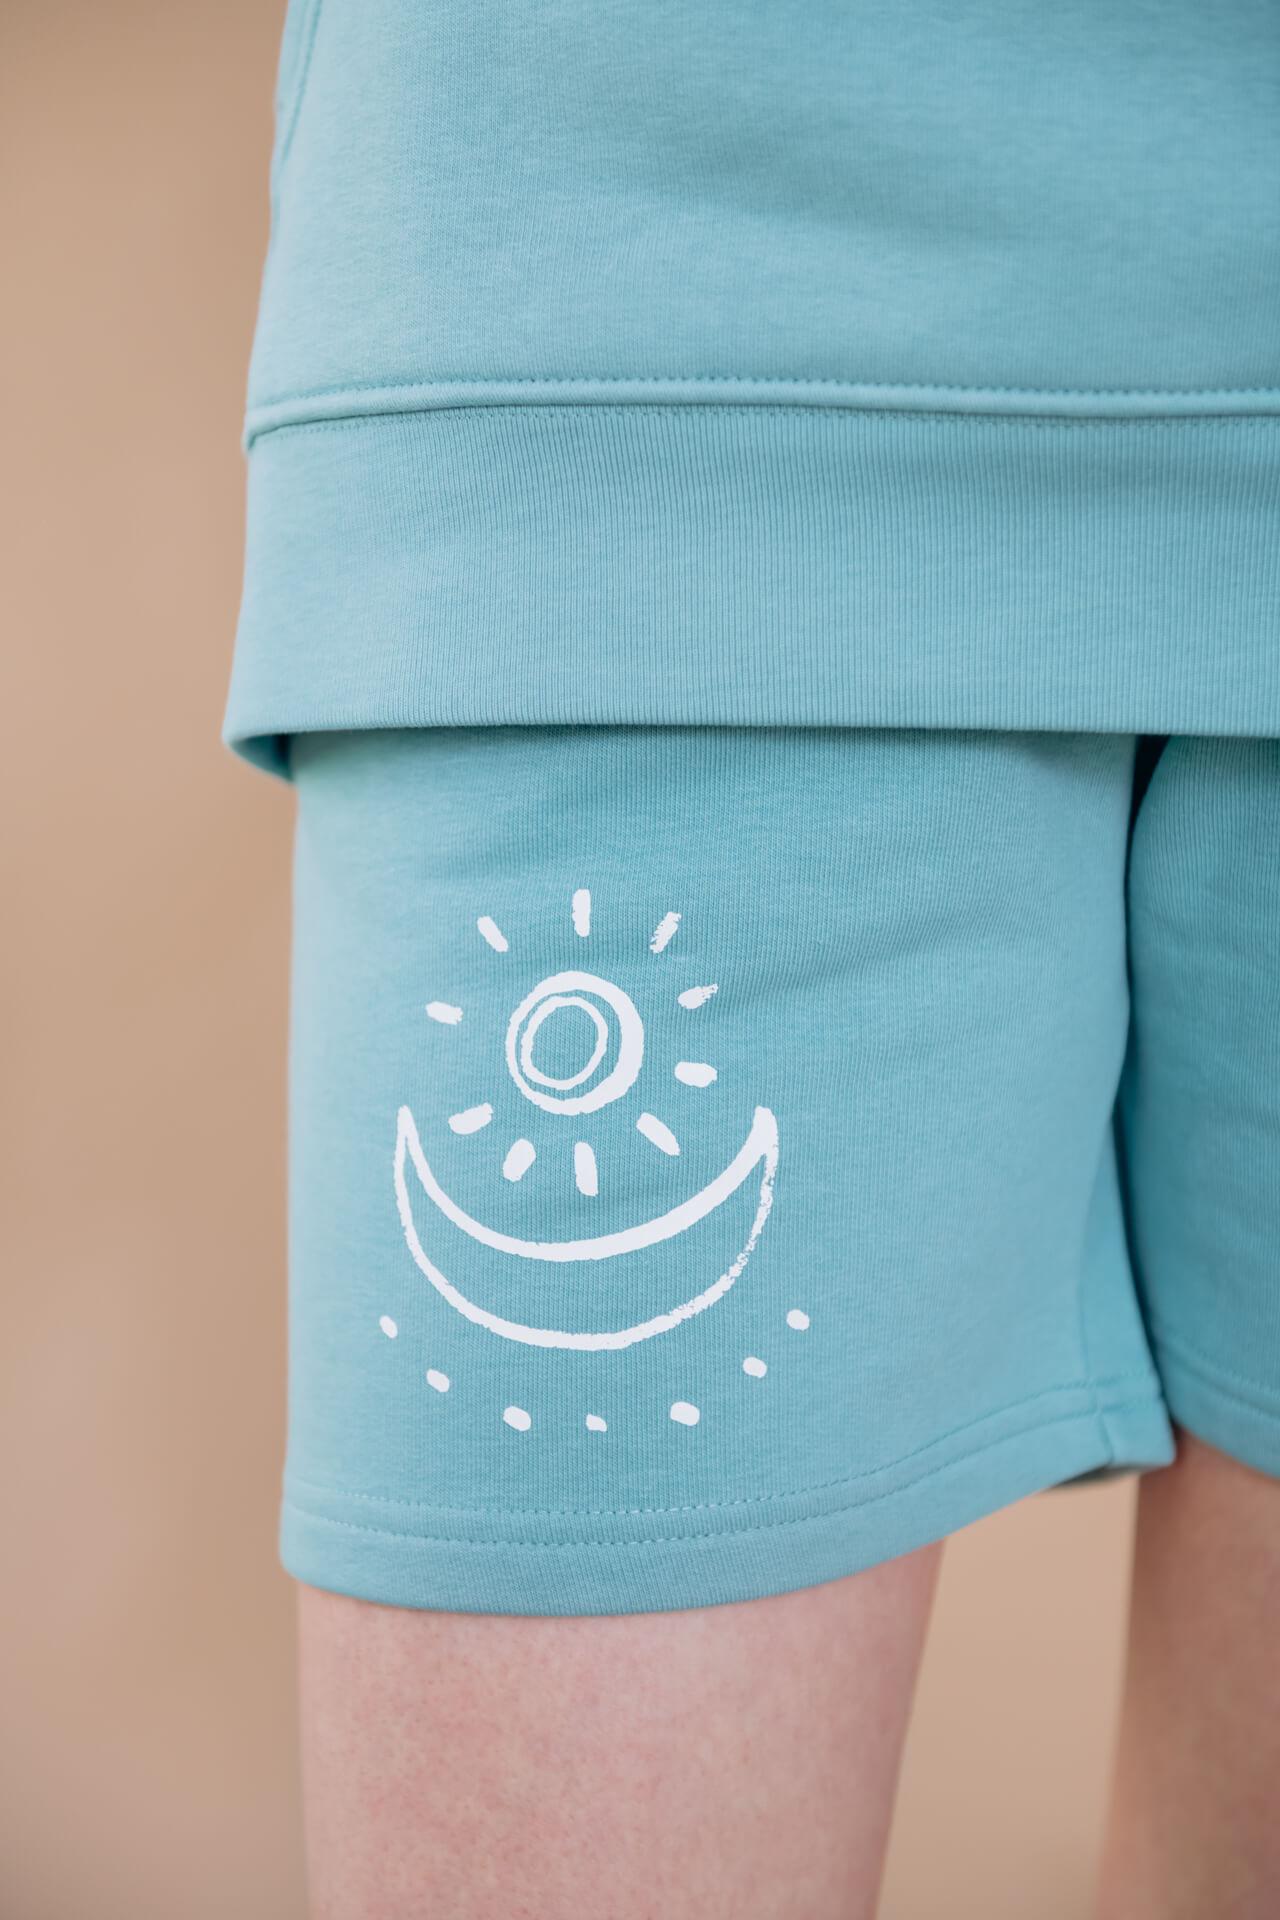 thefemaleexplorer-merch-sweat-shorts-boho-moon-w-6434